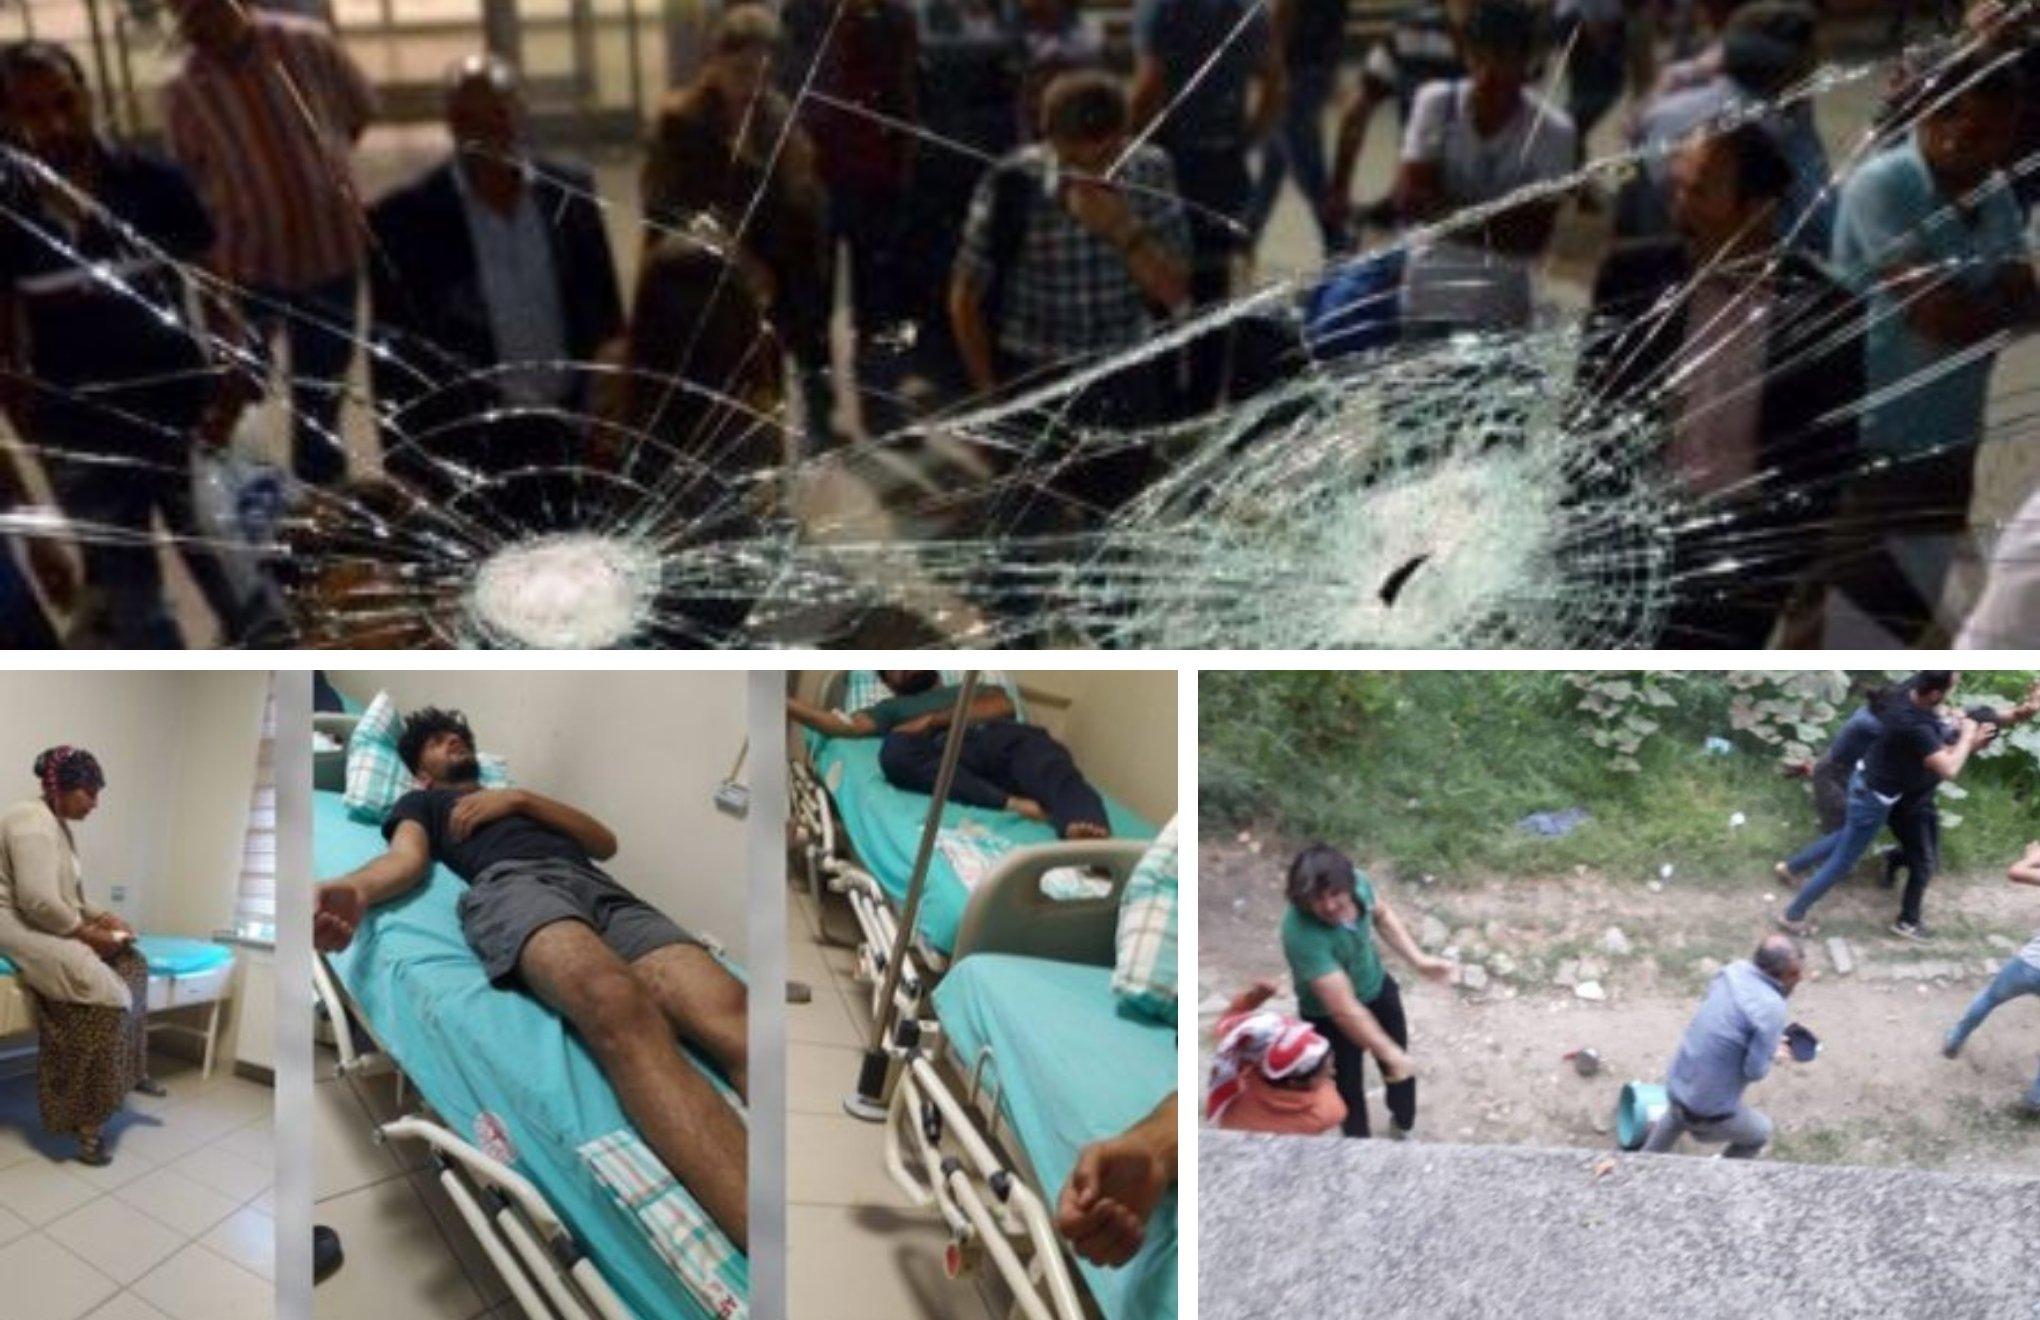 Racist attacks on Kurds in western Turkey